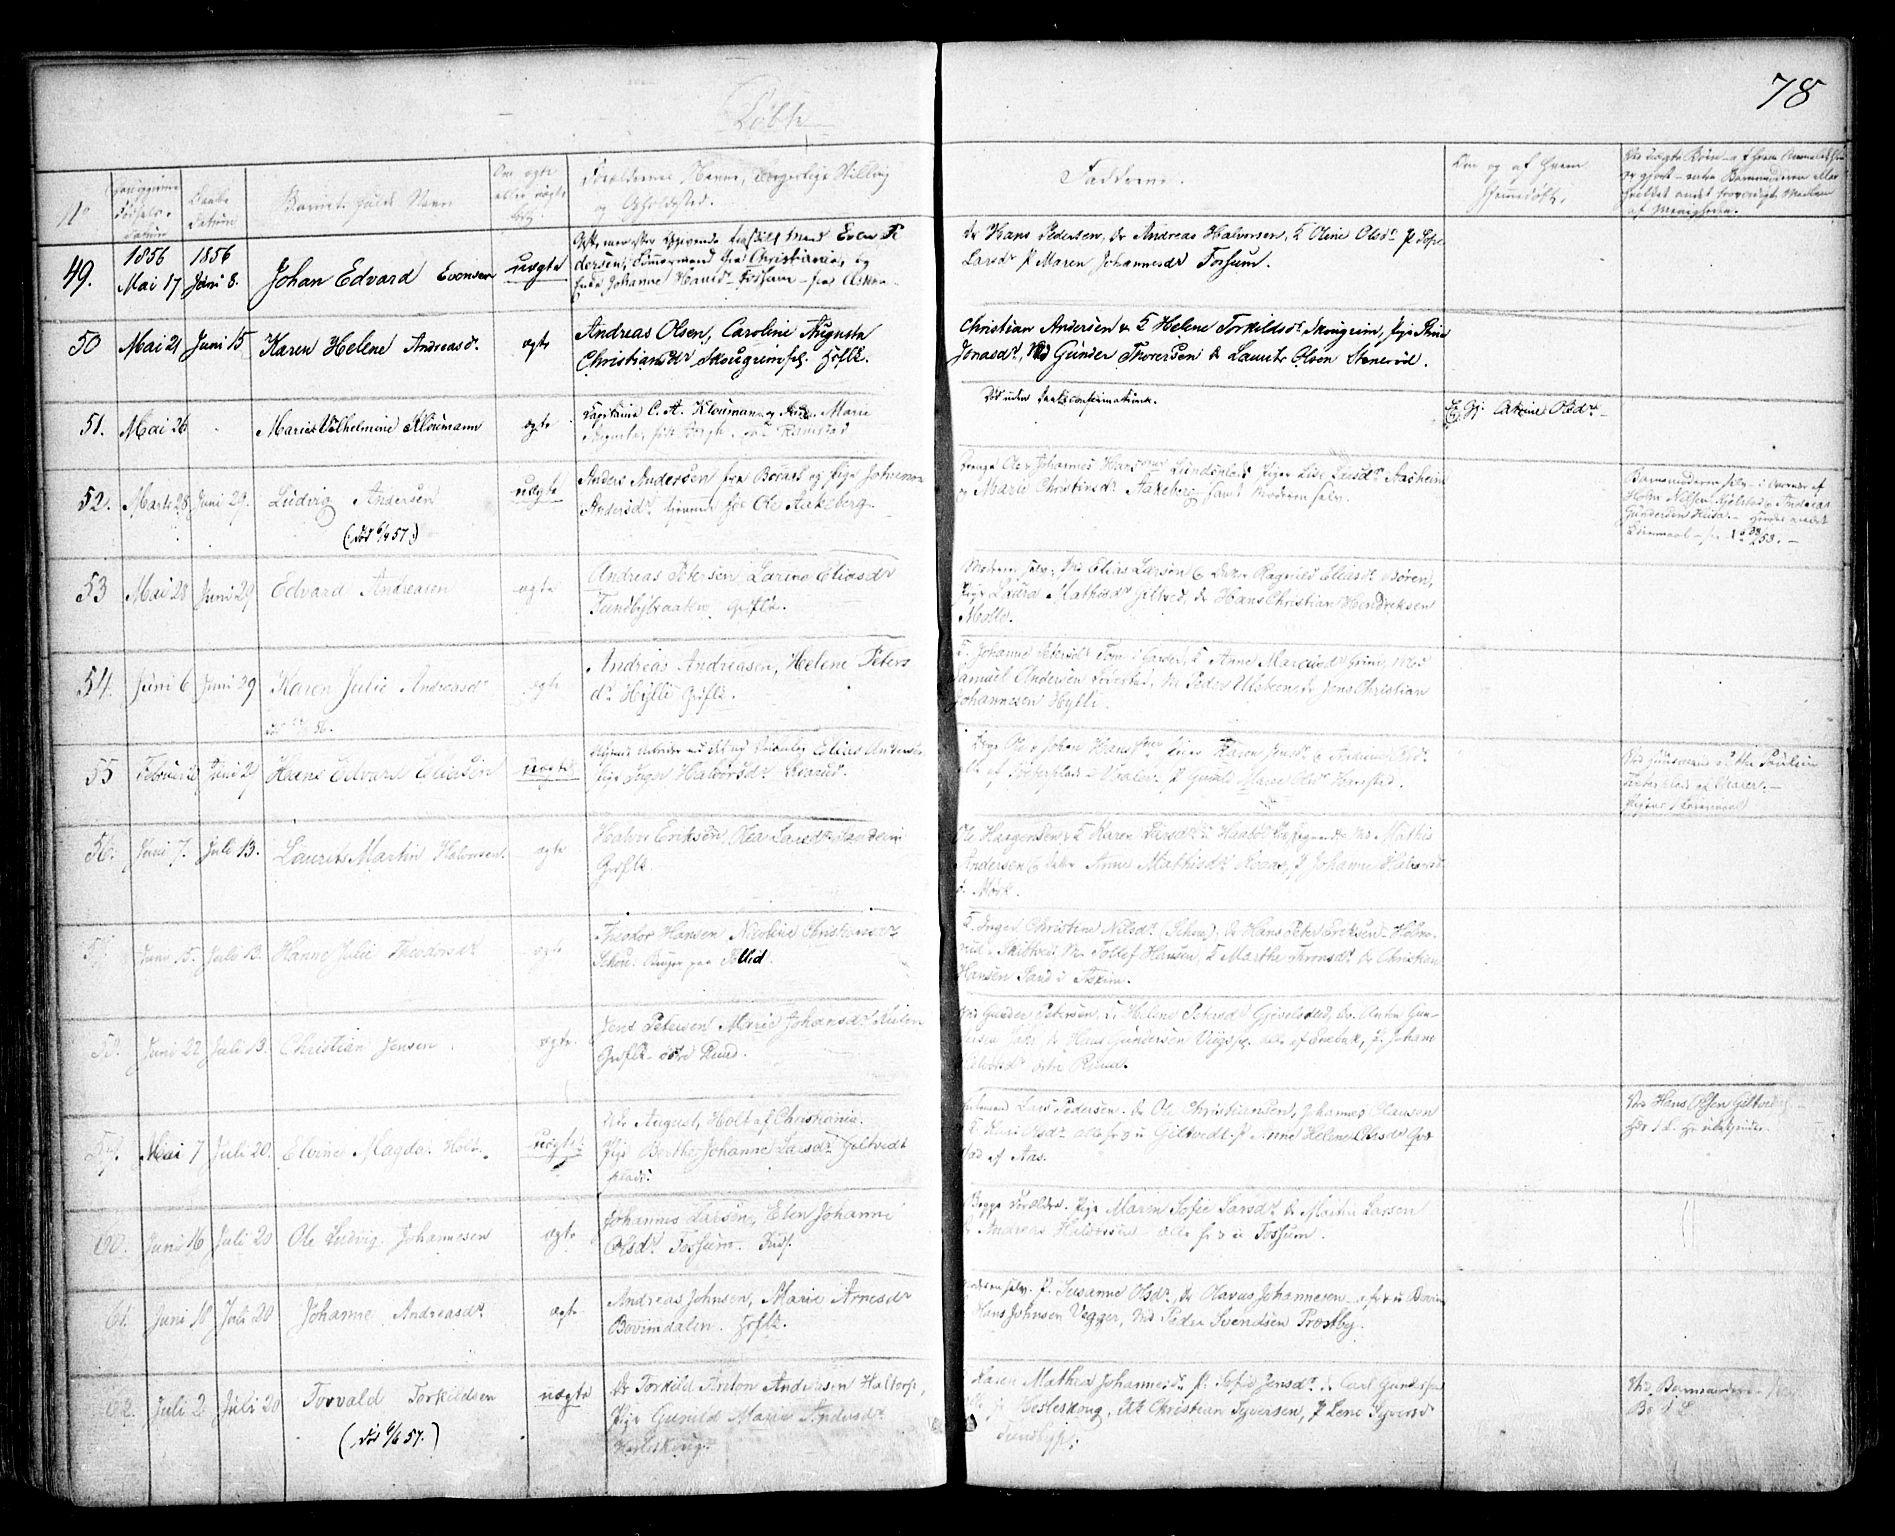 SAO, Spydeberg prestekontor Kirkebøker, F/Fa/L0005: Ministerialbok nr. I 5, 1842-1862, s. 78